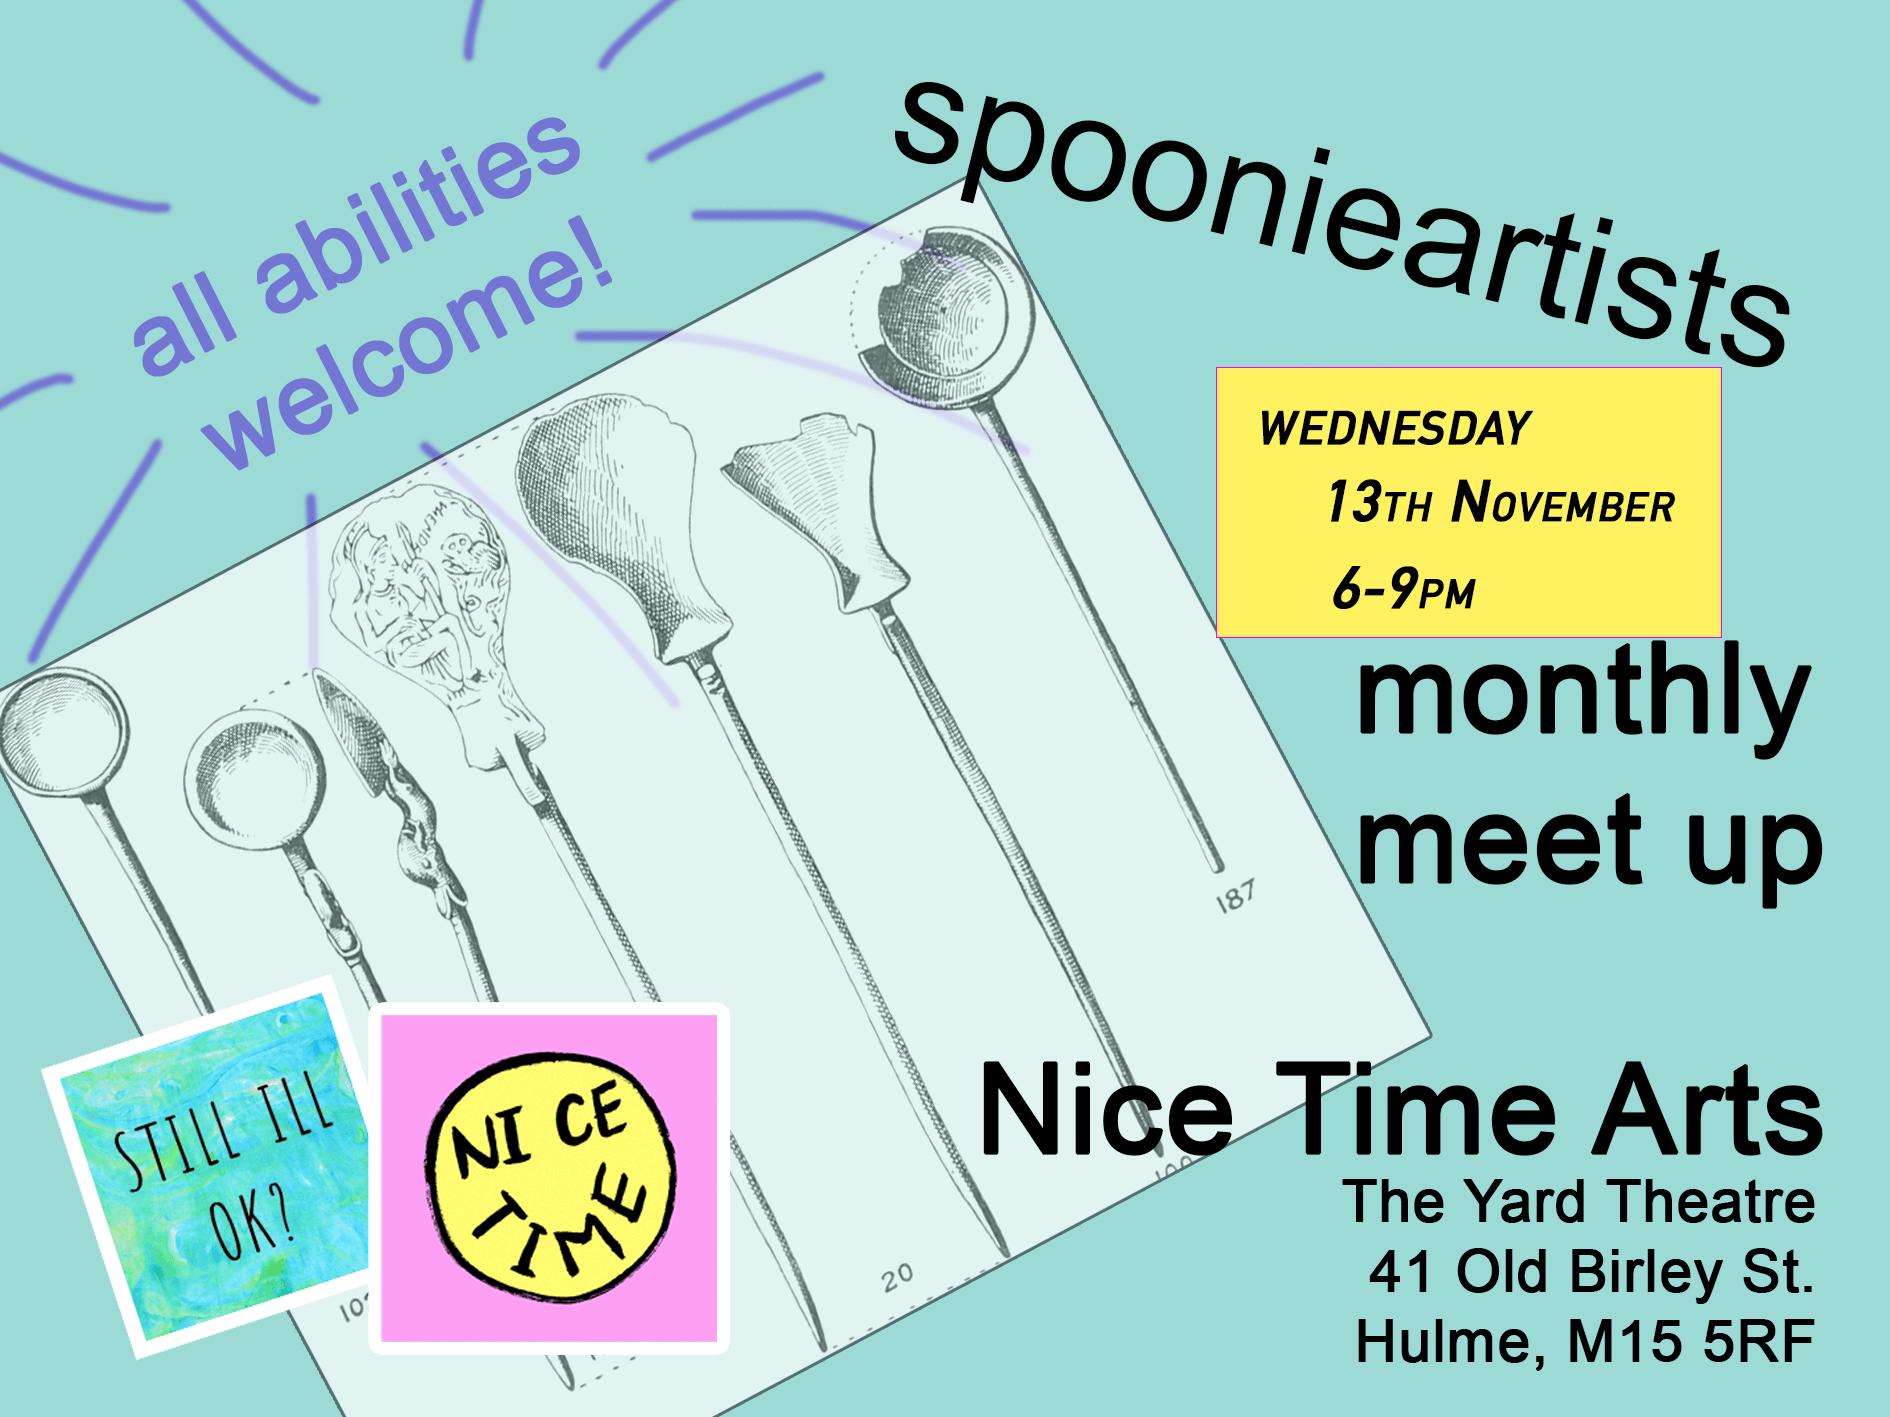 Wednesday heralds spoonie artist meet-up #2!